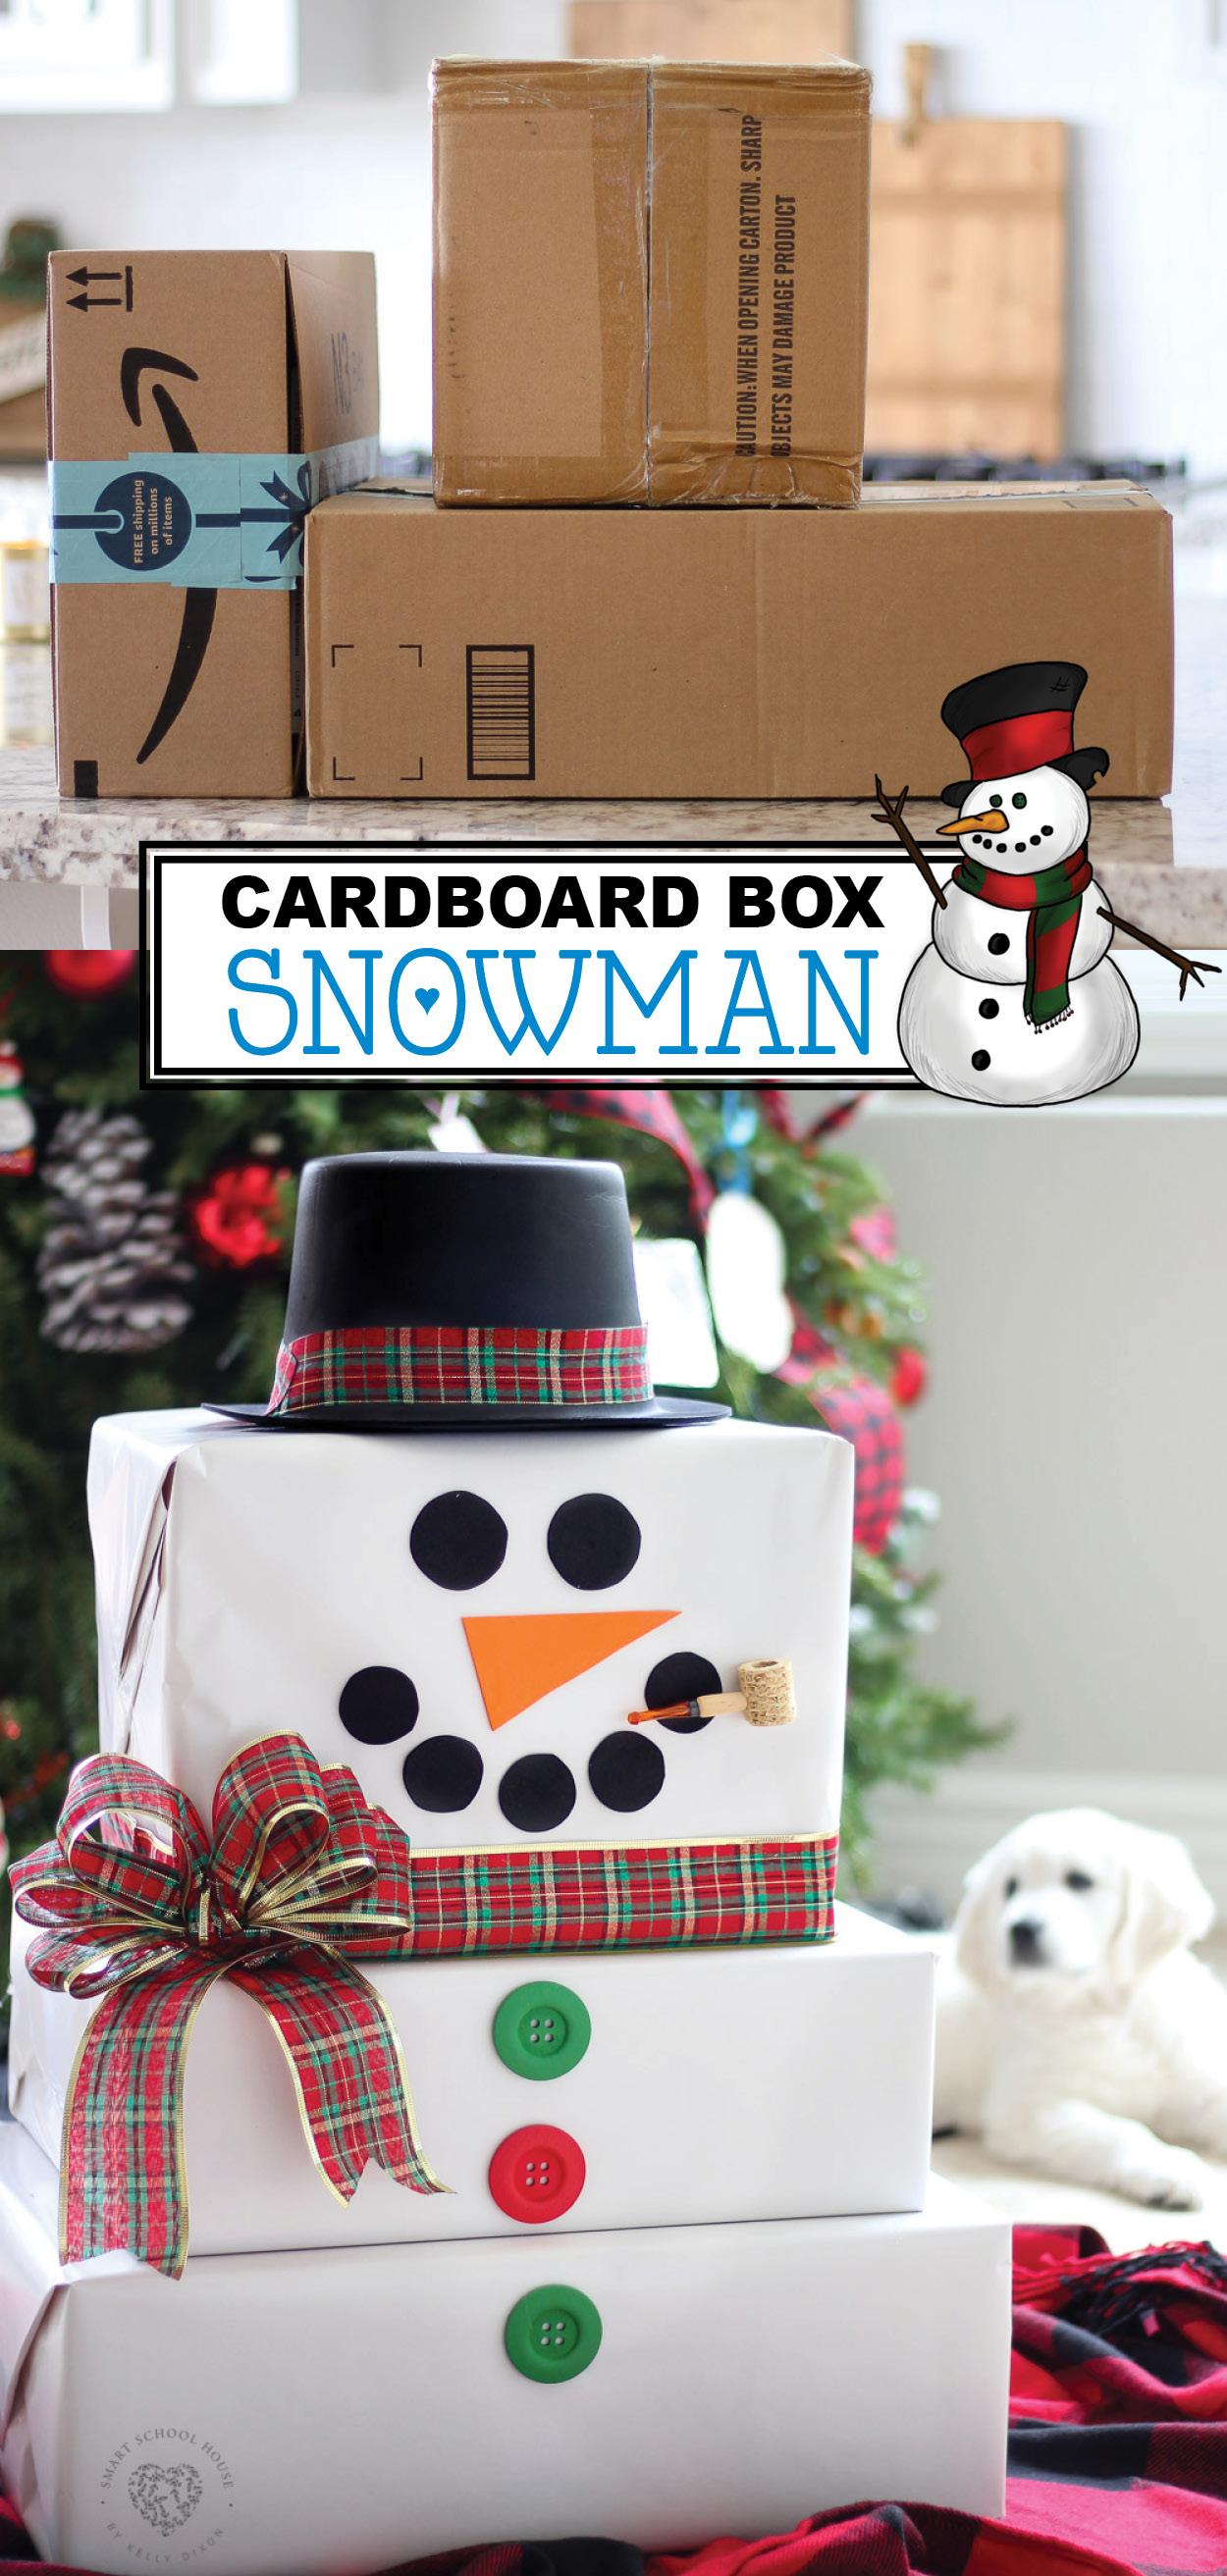 Cardboard Box Snowman